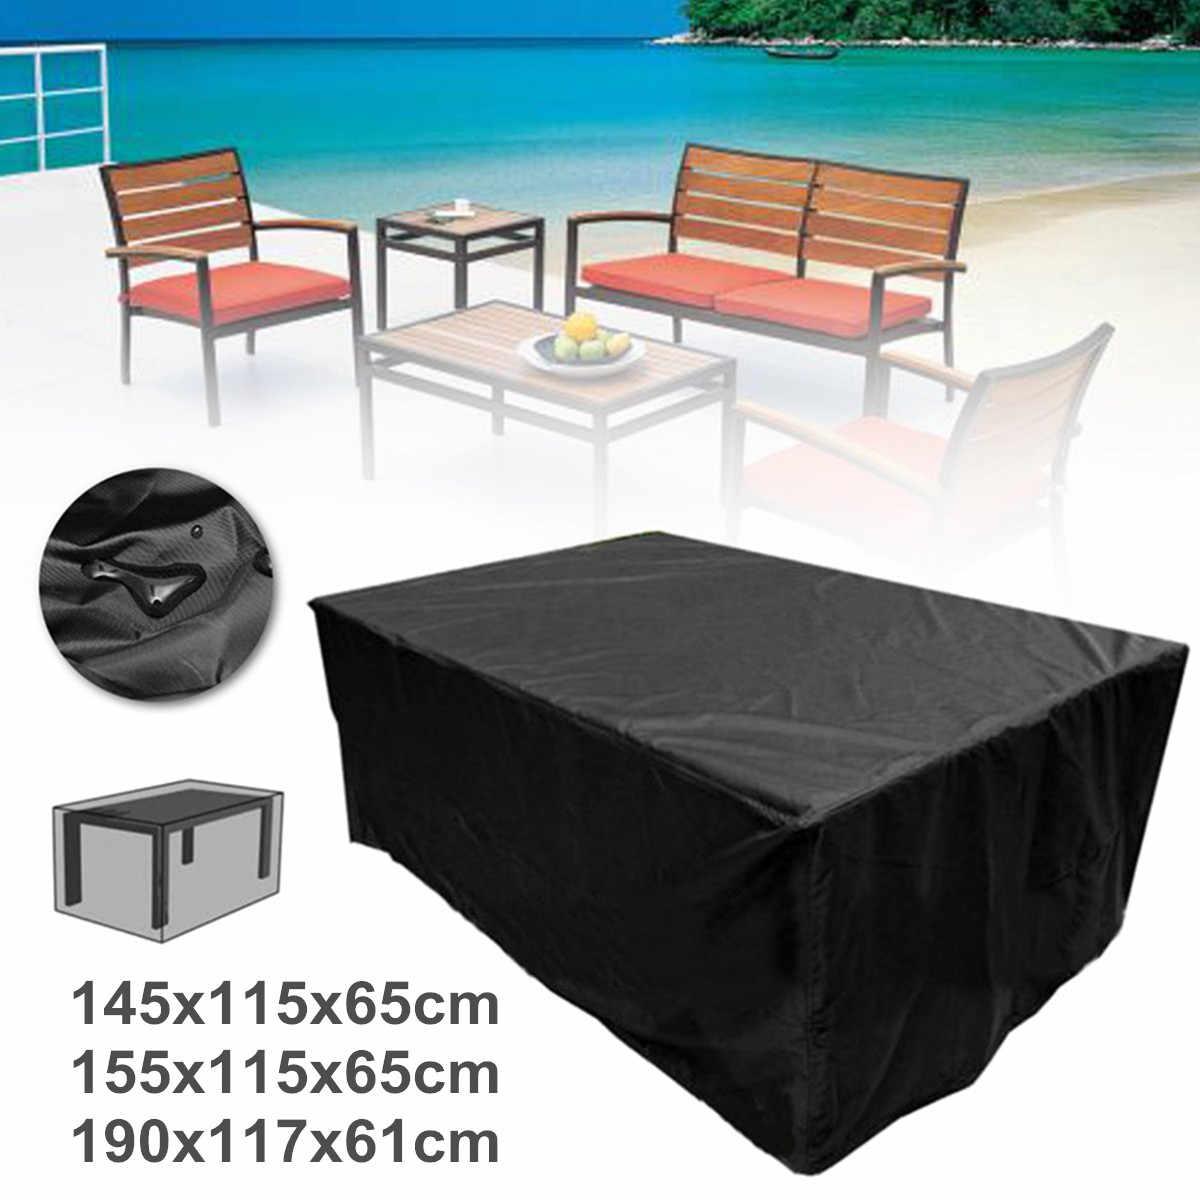 Rattan Furniture Set Protective Cover